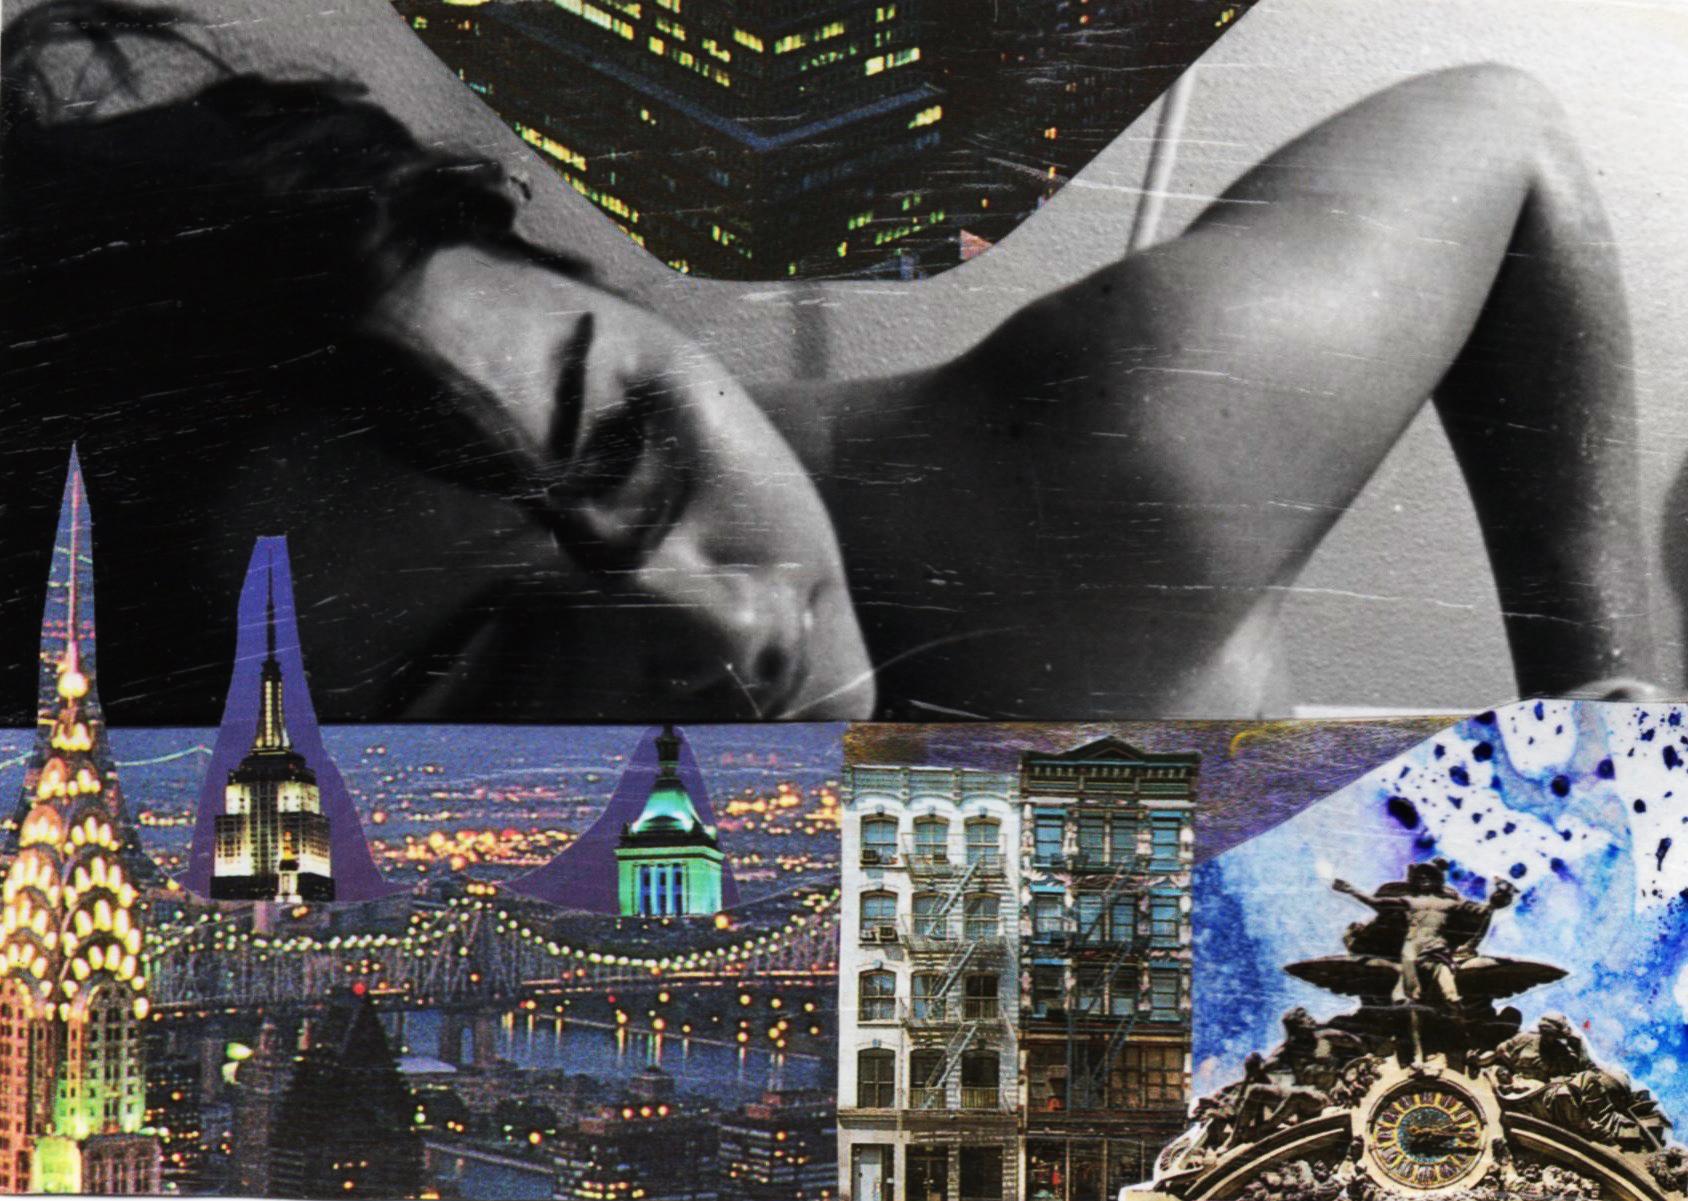 Nightlife 2015 M.Ayala #3 copy.jpg